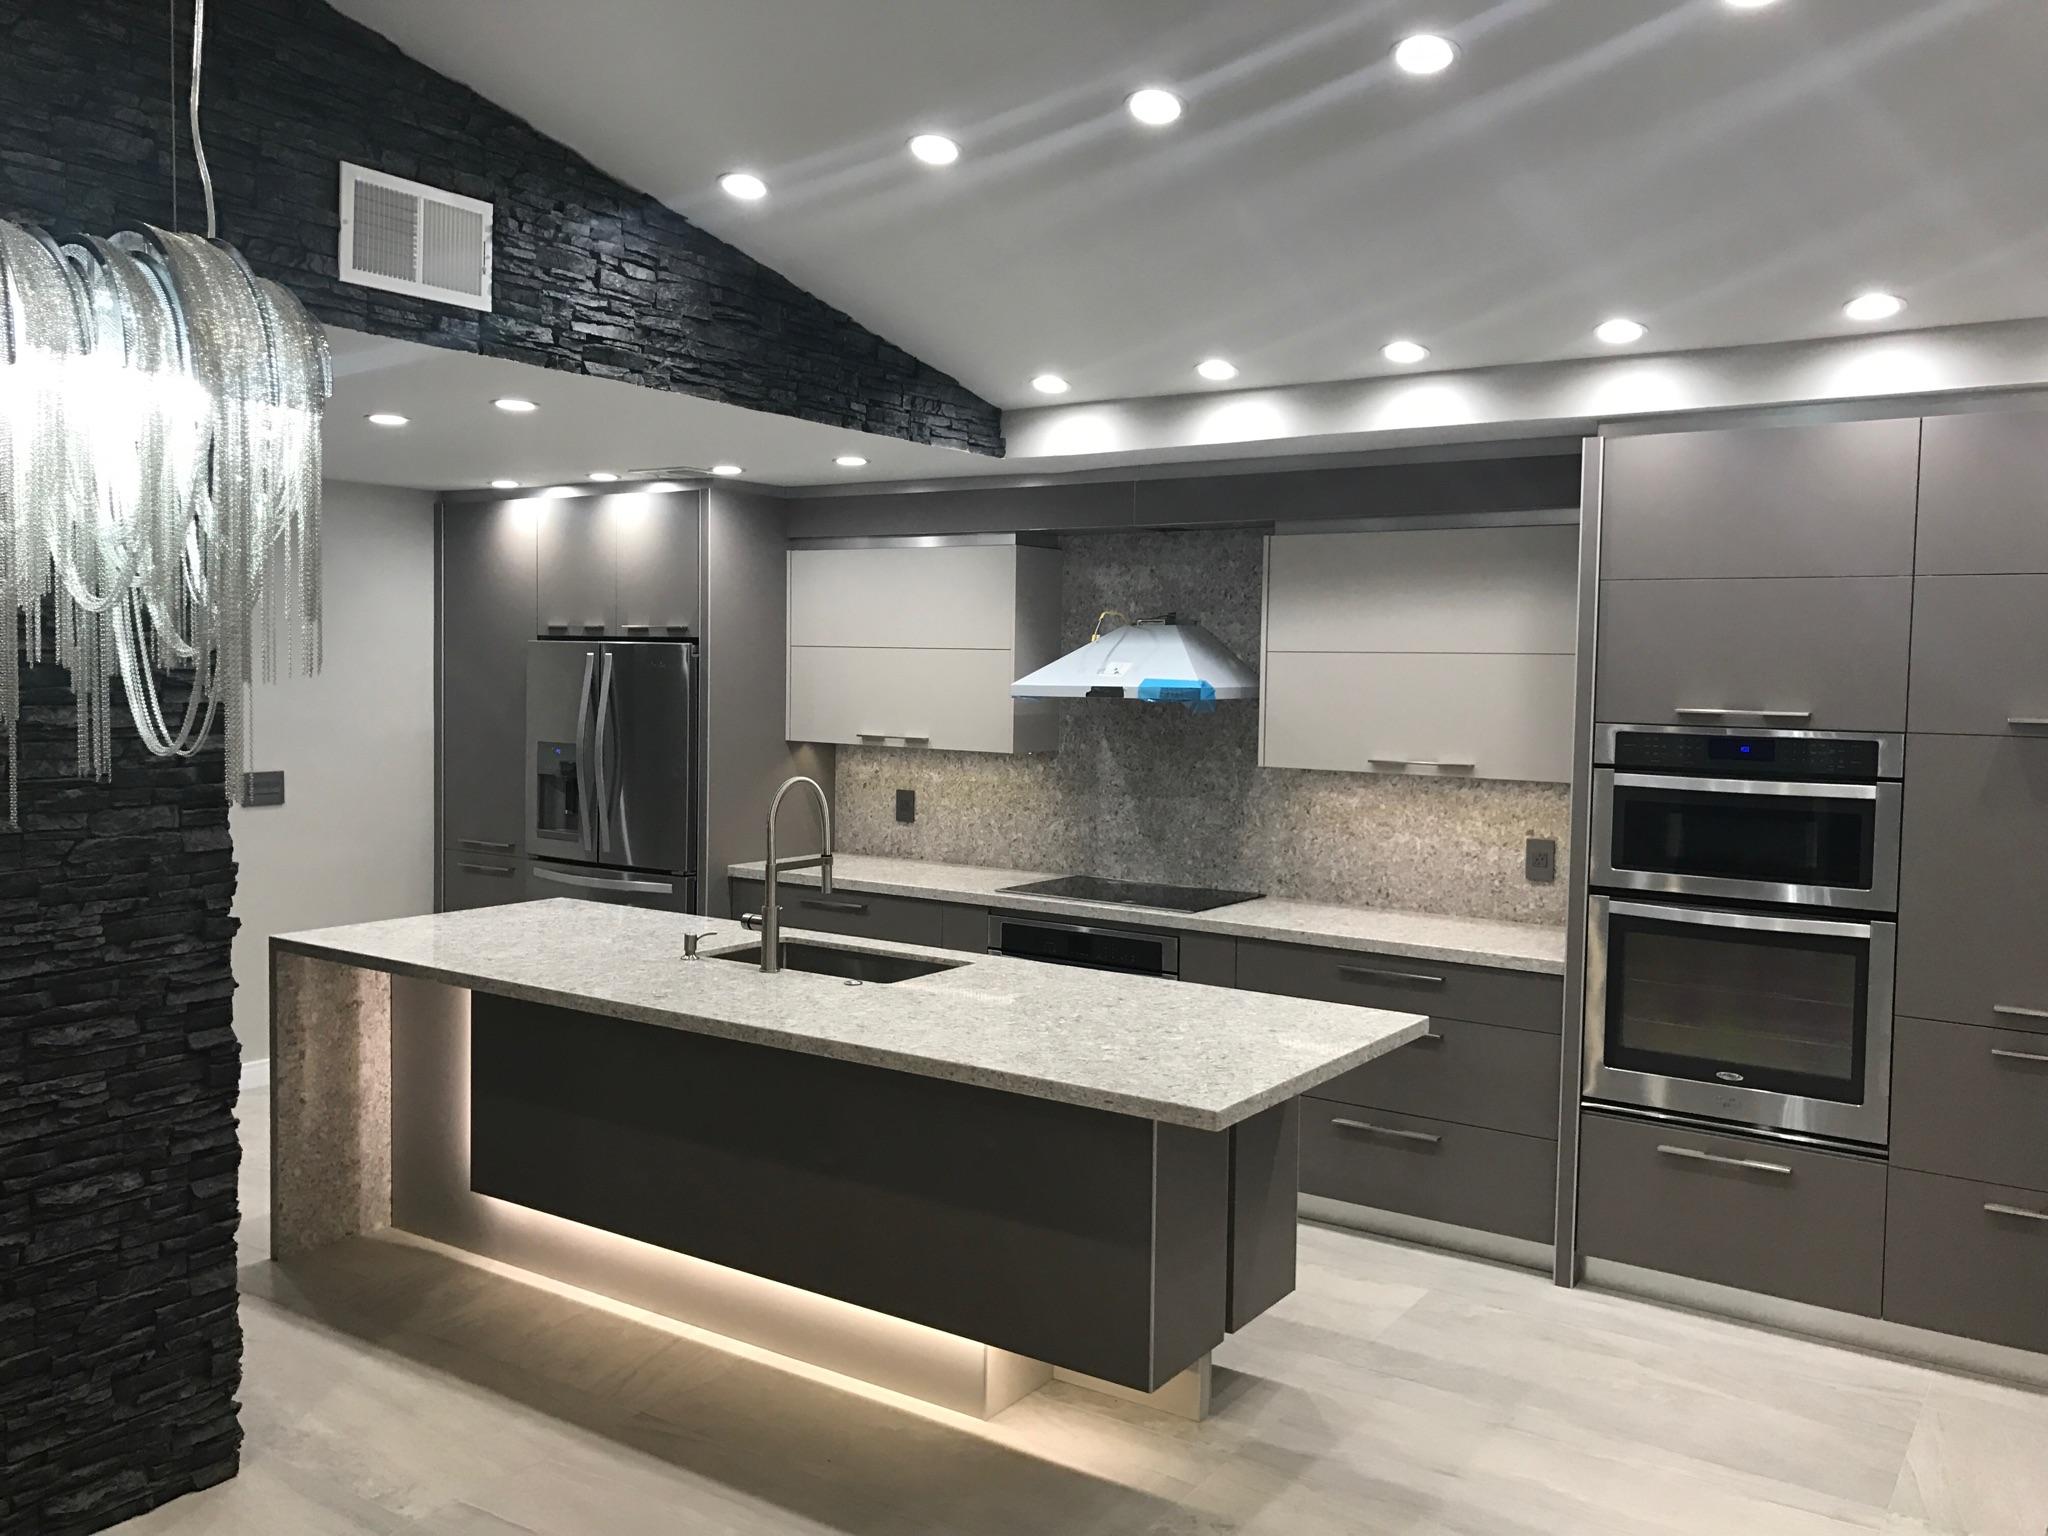 Modern Kitchen Cabinets New Kitchen Cabinets Fort Lauderdale